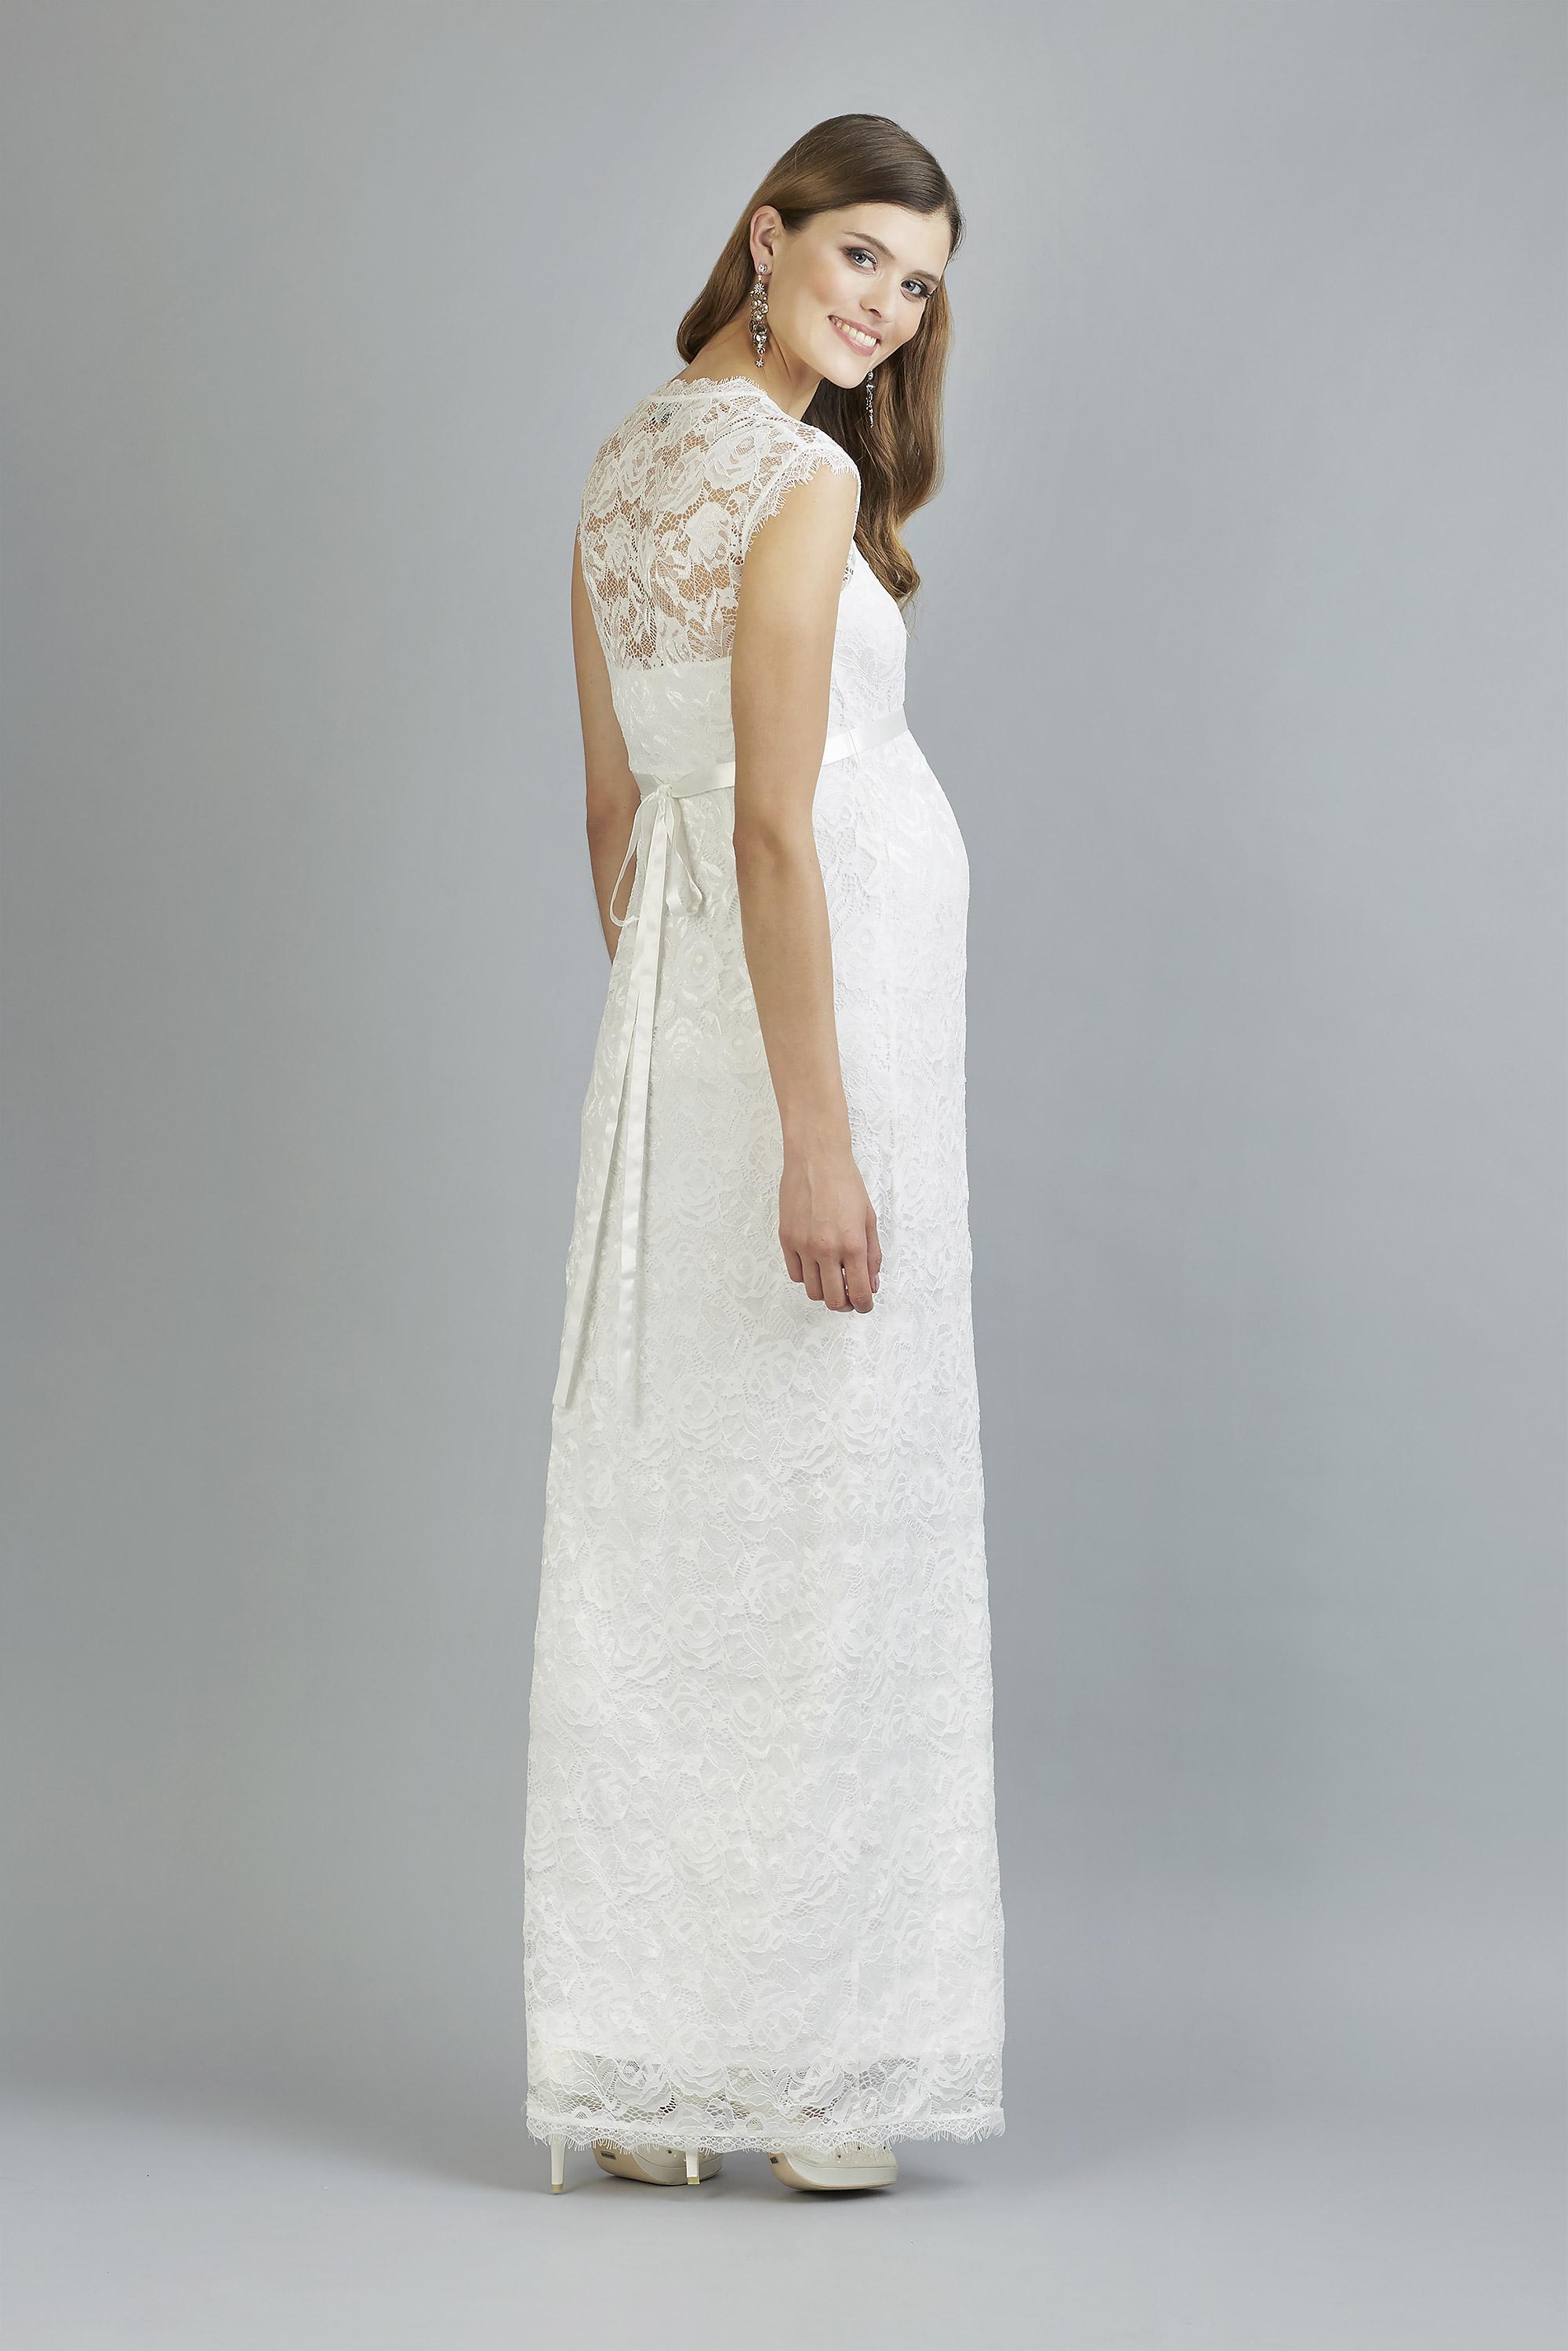 Sweetbelly 2019 Umstandskleid Catherina Ivory Langes Kleid Back Avorio Vestito Eiche Brautmode Berlin